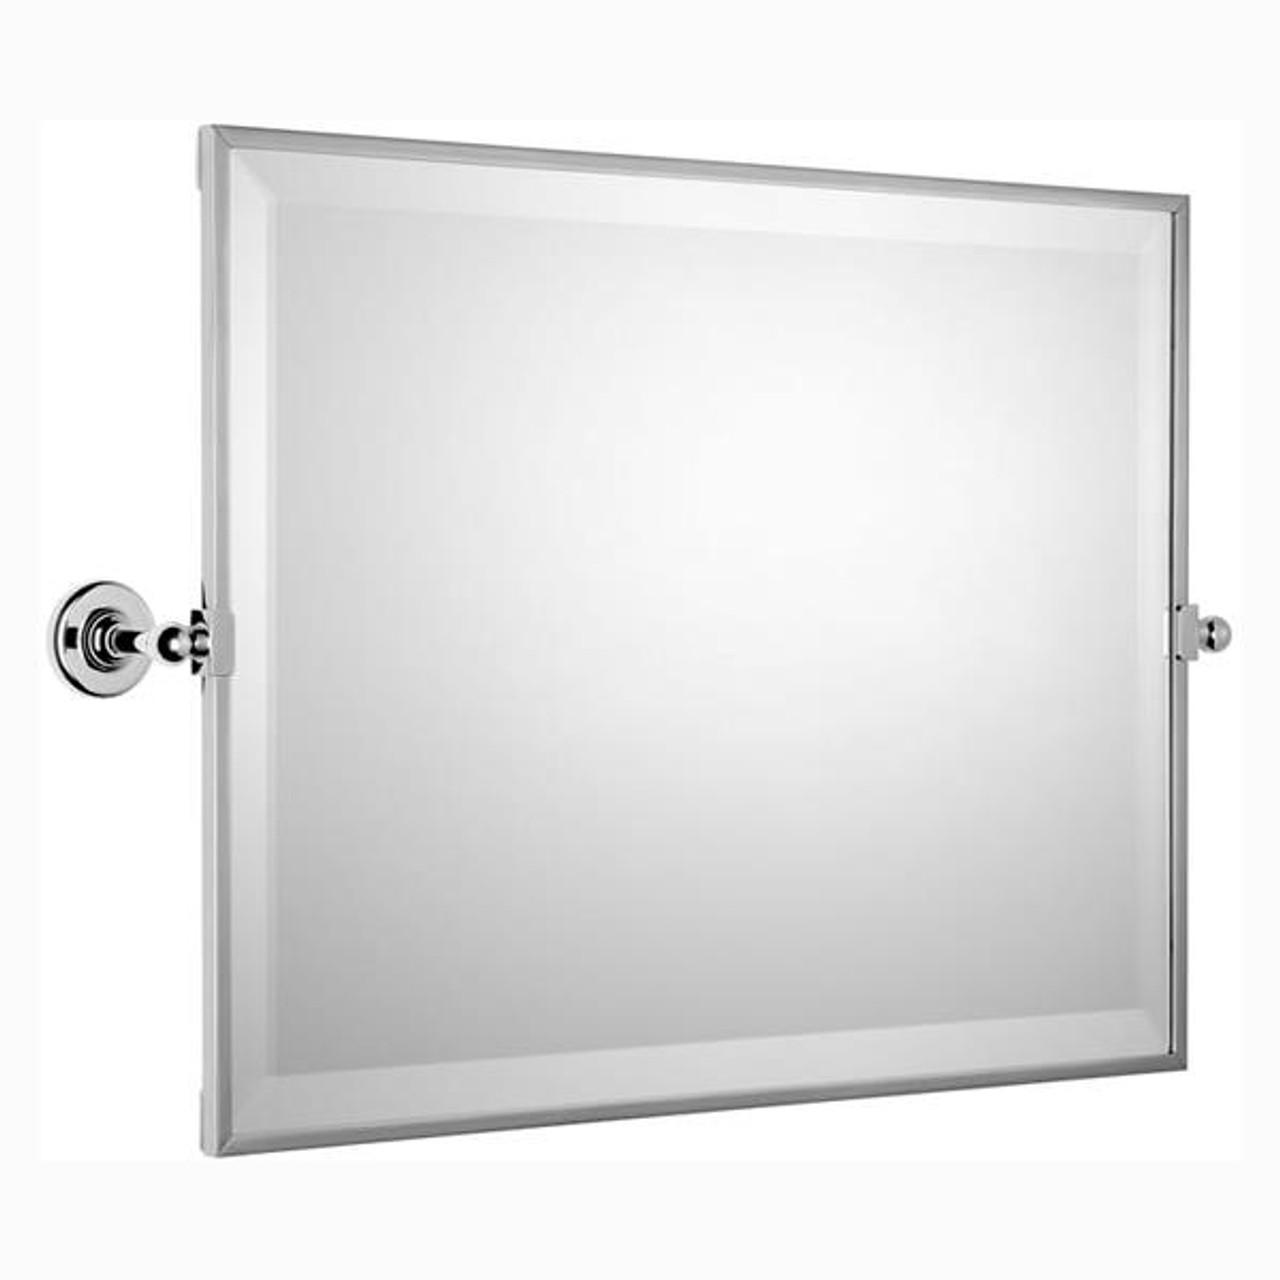 Chrome Plated Samuel Heath Antique Framed Horizontal Mirror N4343